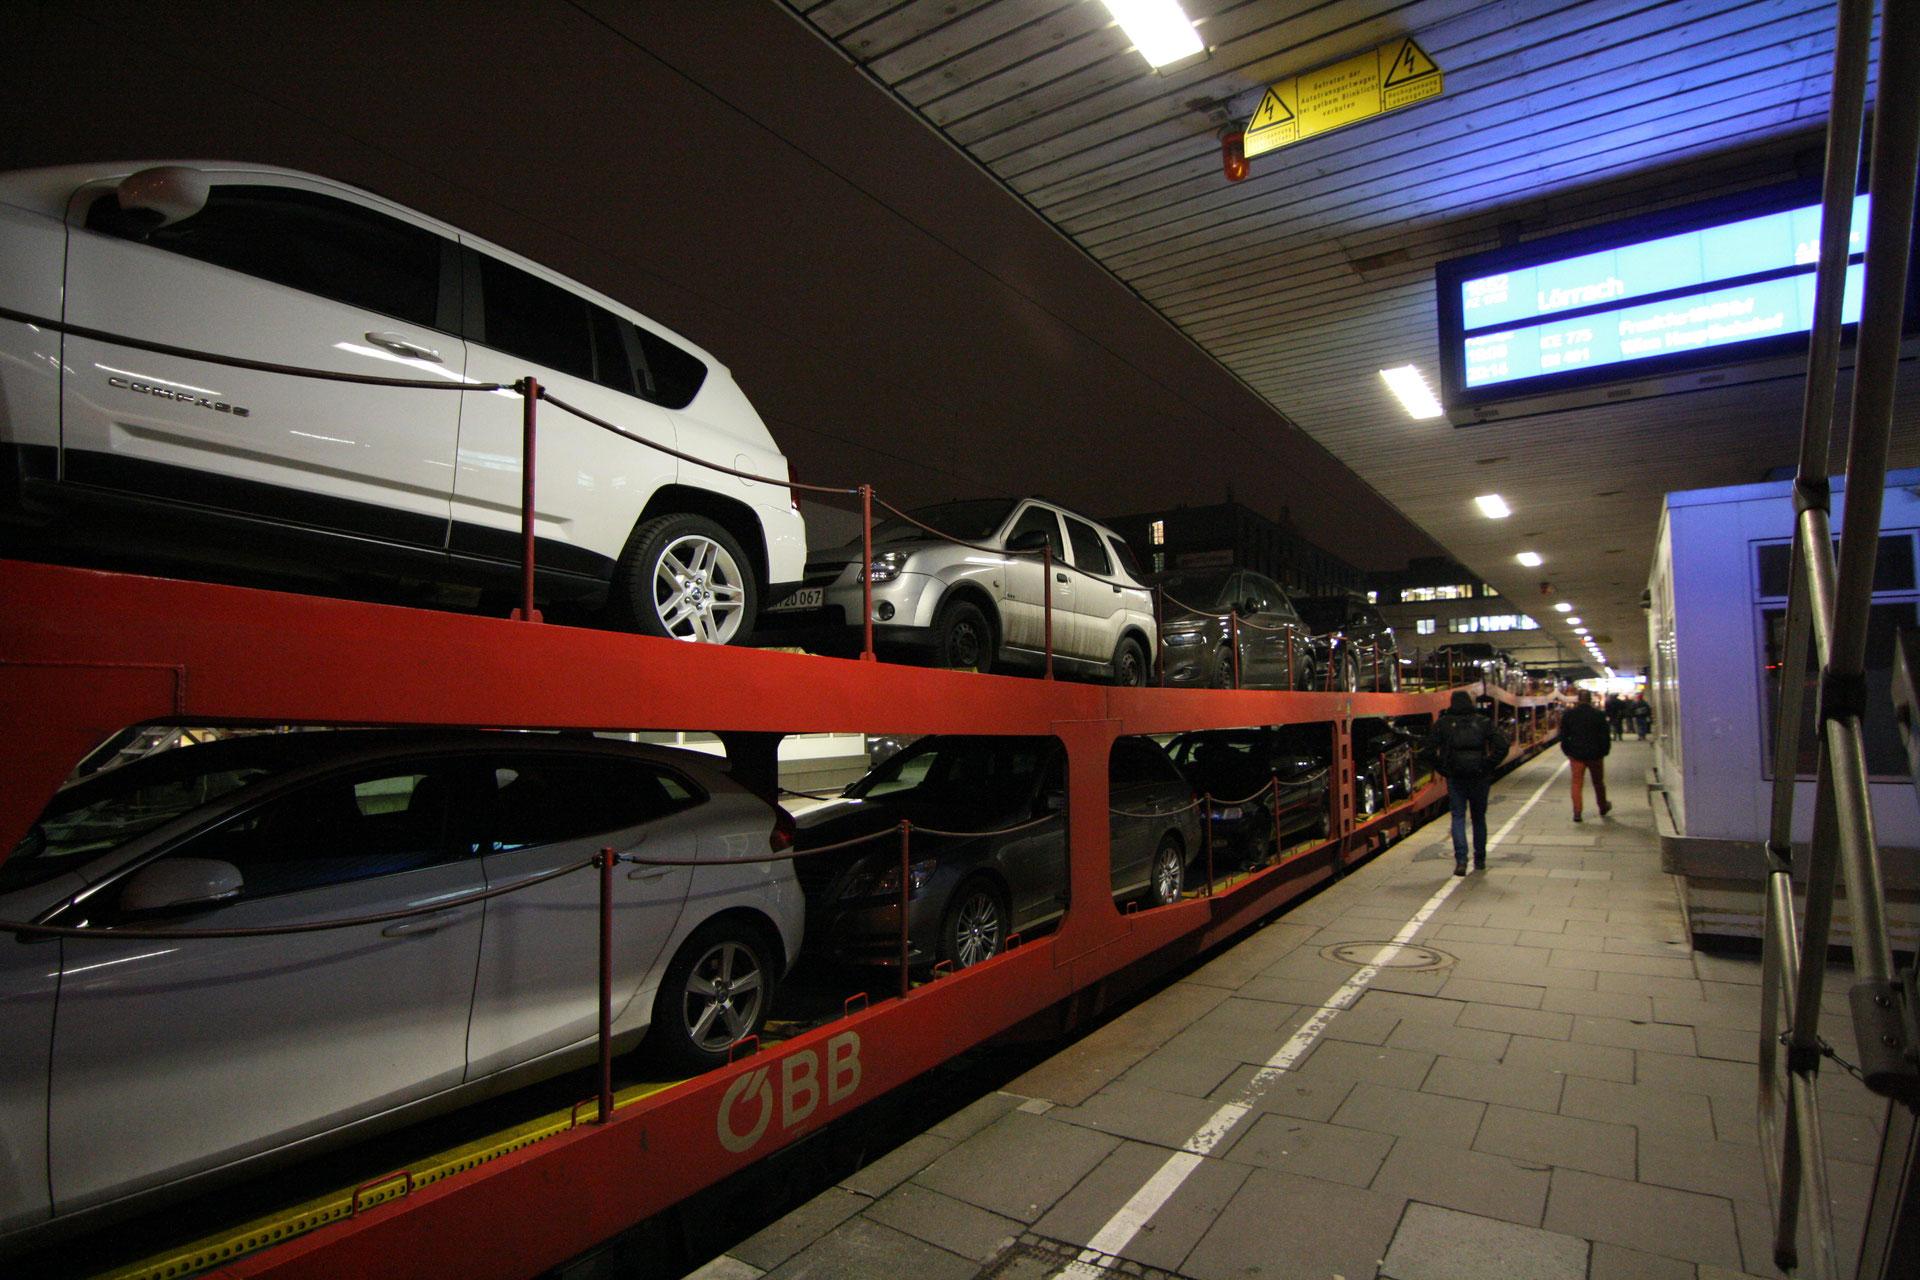 autozug düsseldorf innsbruck